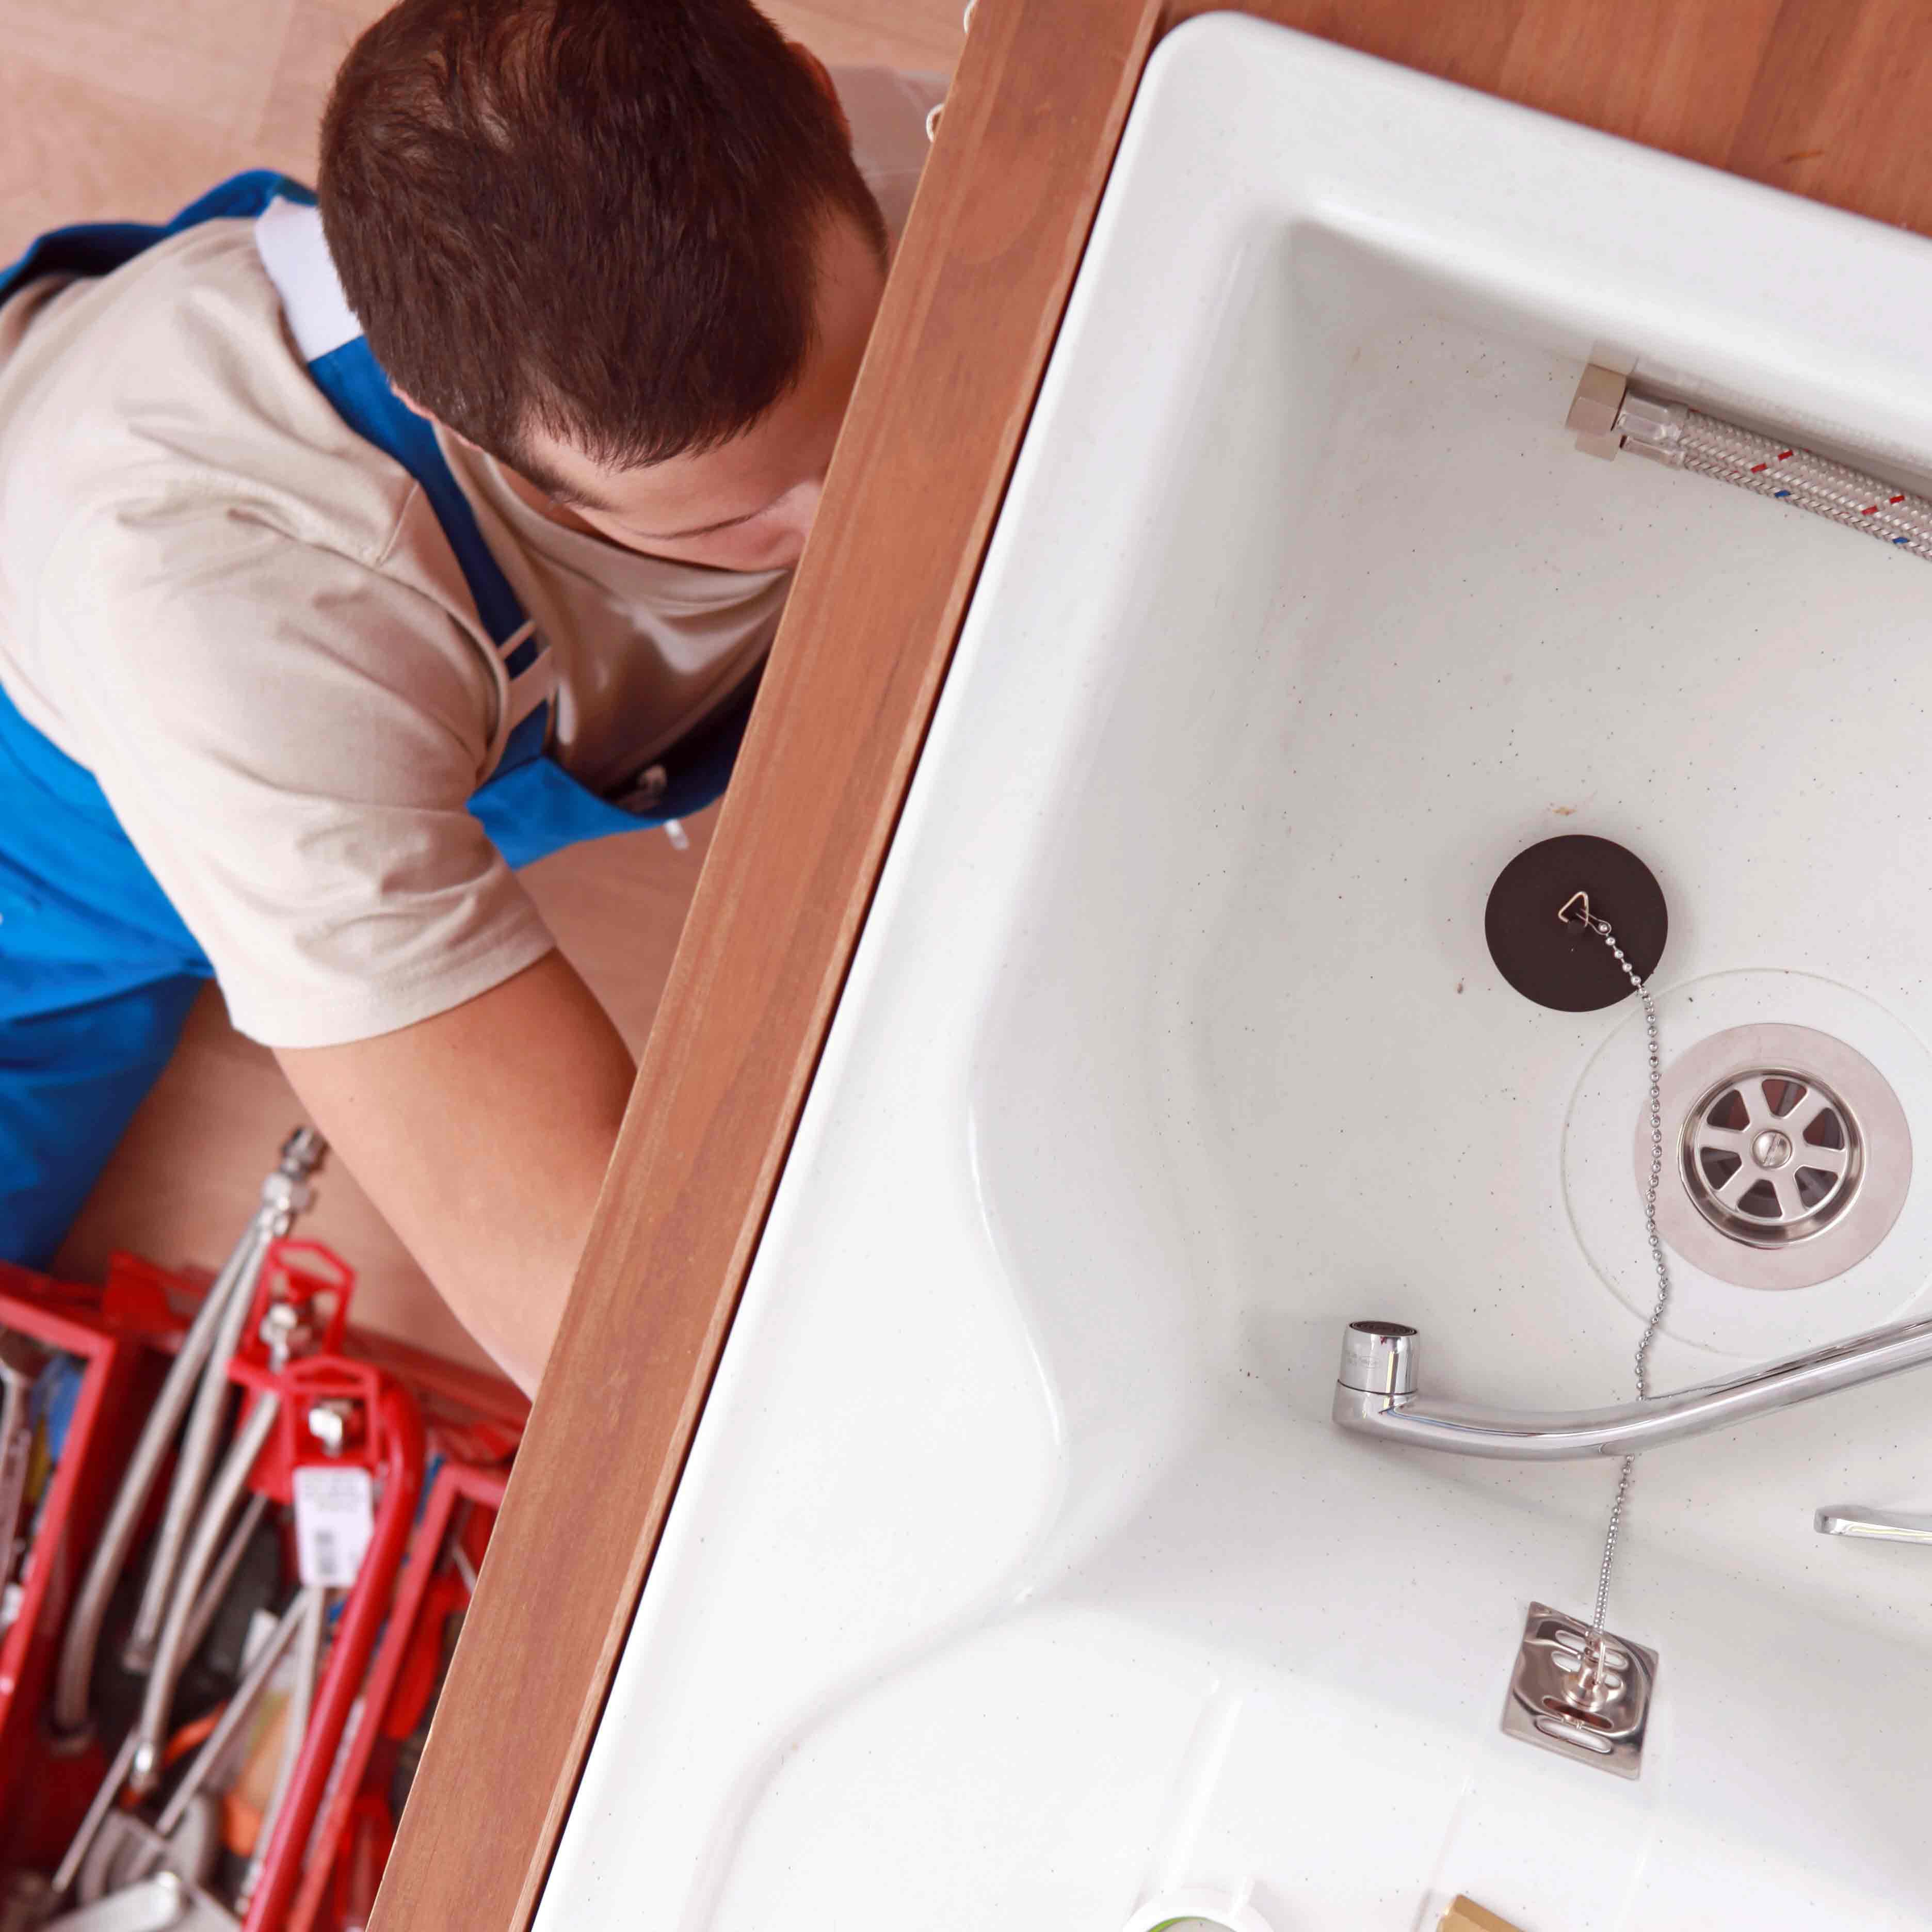 residential commercial plumbing plumber working